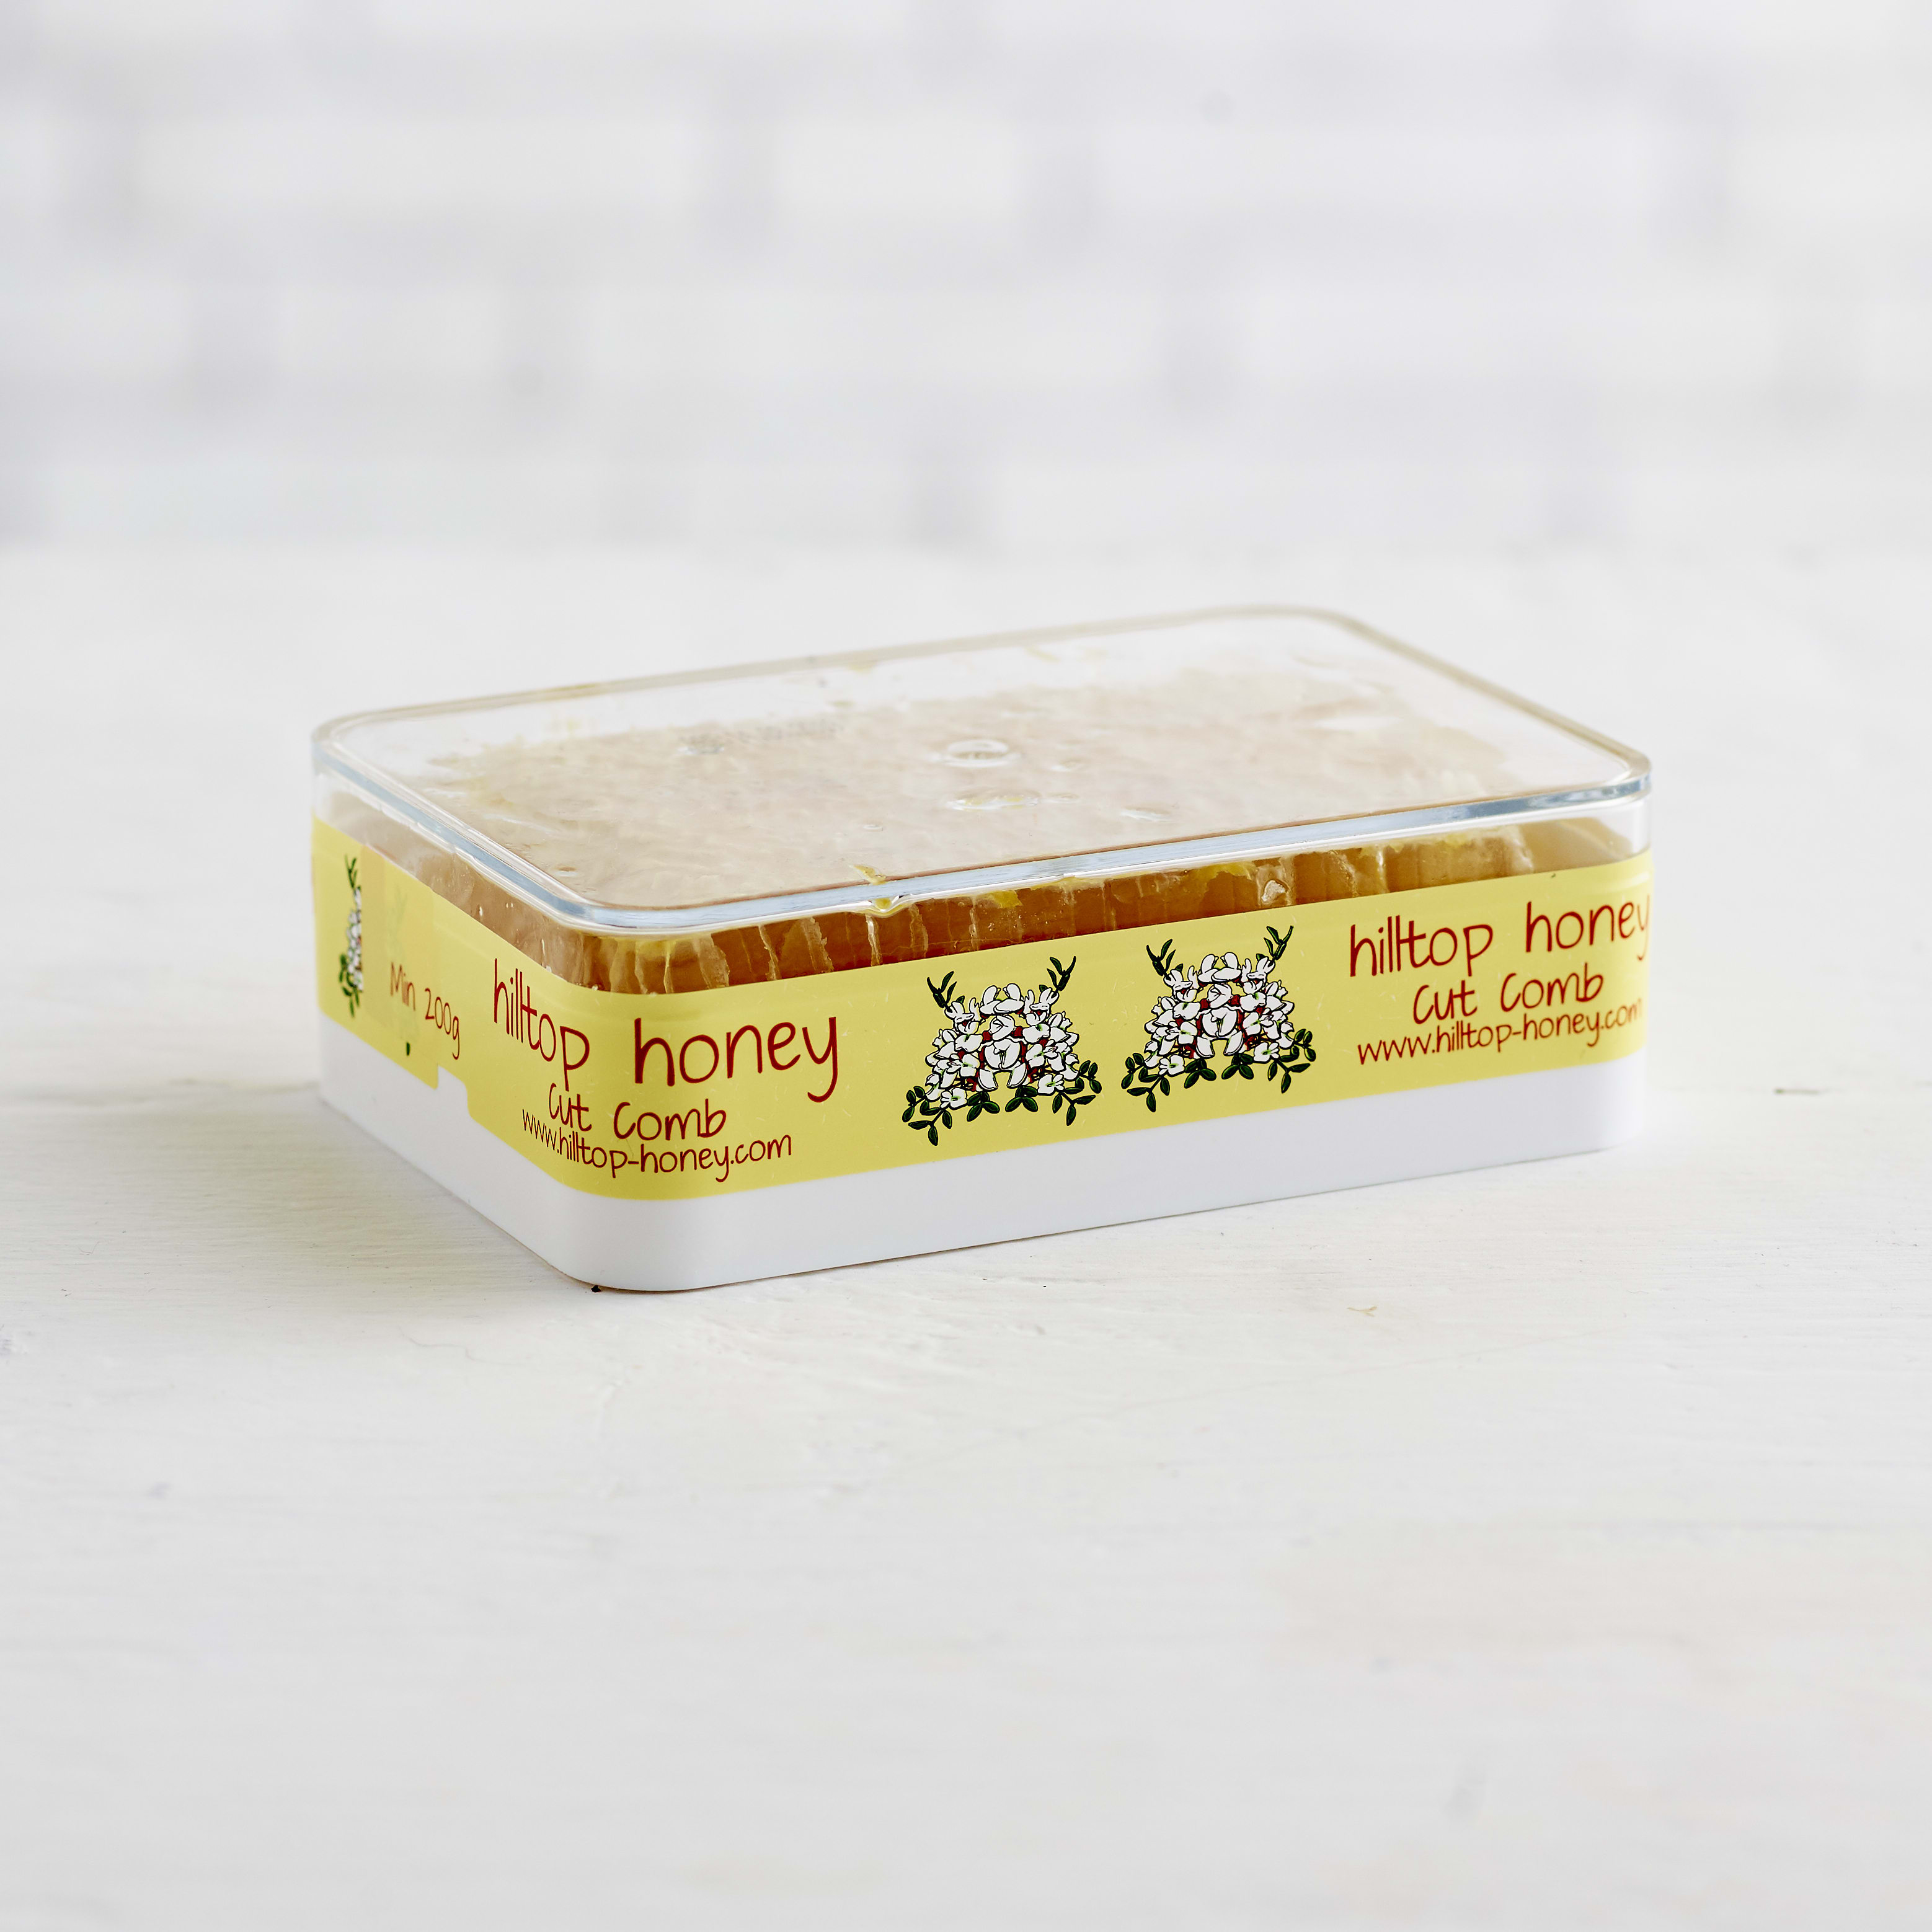 Hilltop Honey Honeycomb Slab, 200g